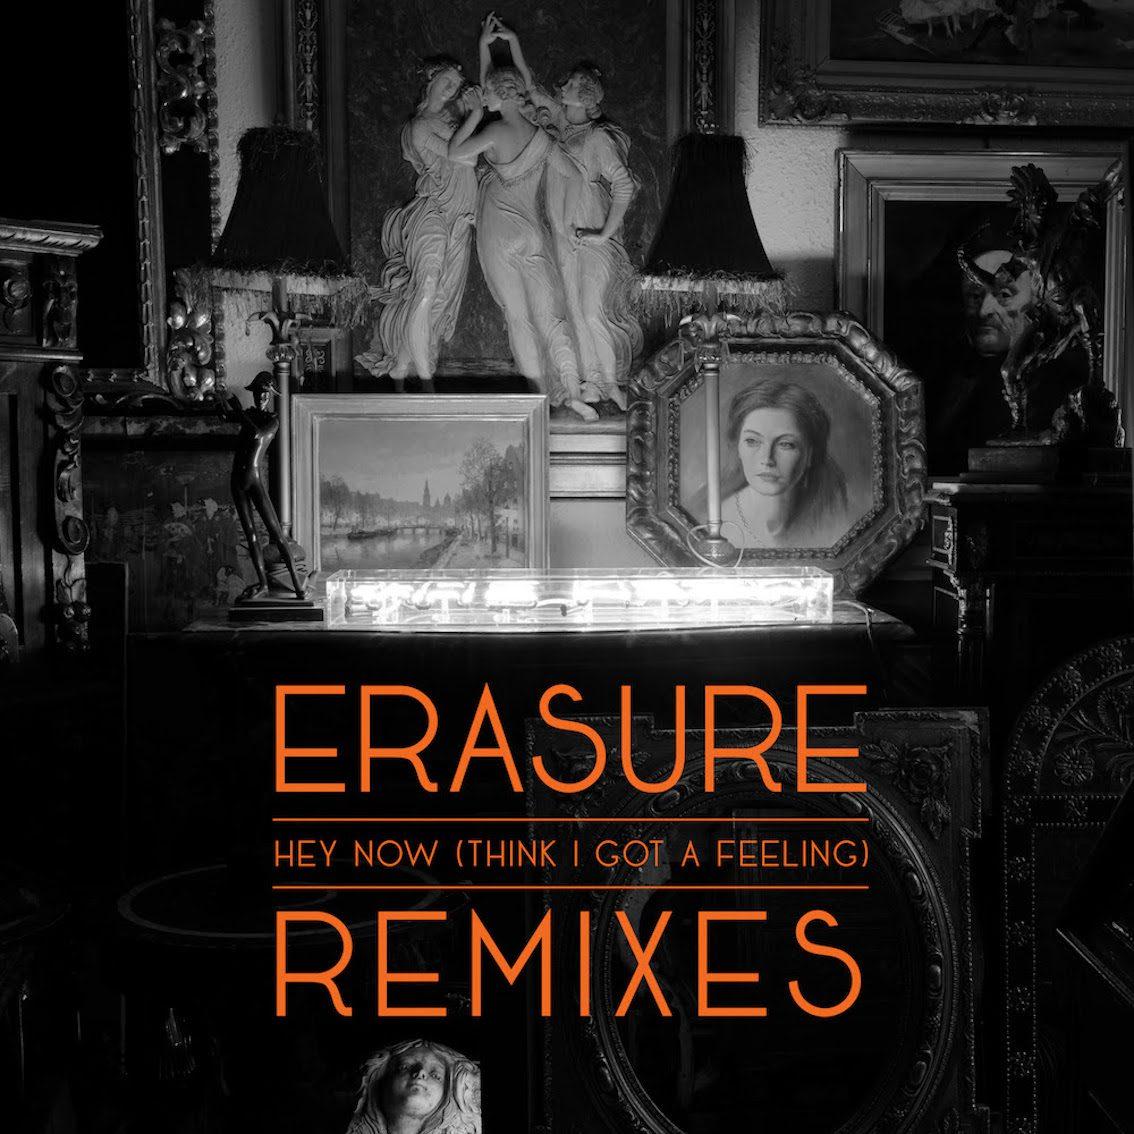 Erasure release new EP feat. remixes of album opener 'Hey Now (Think I Got a Feeling)'